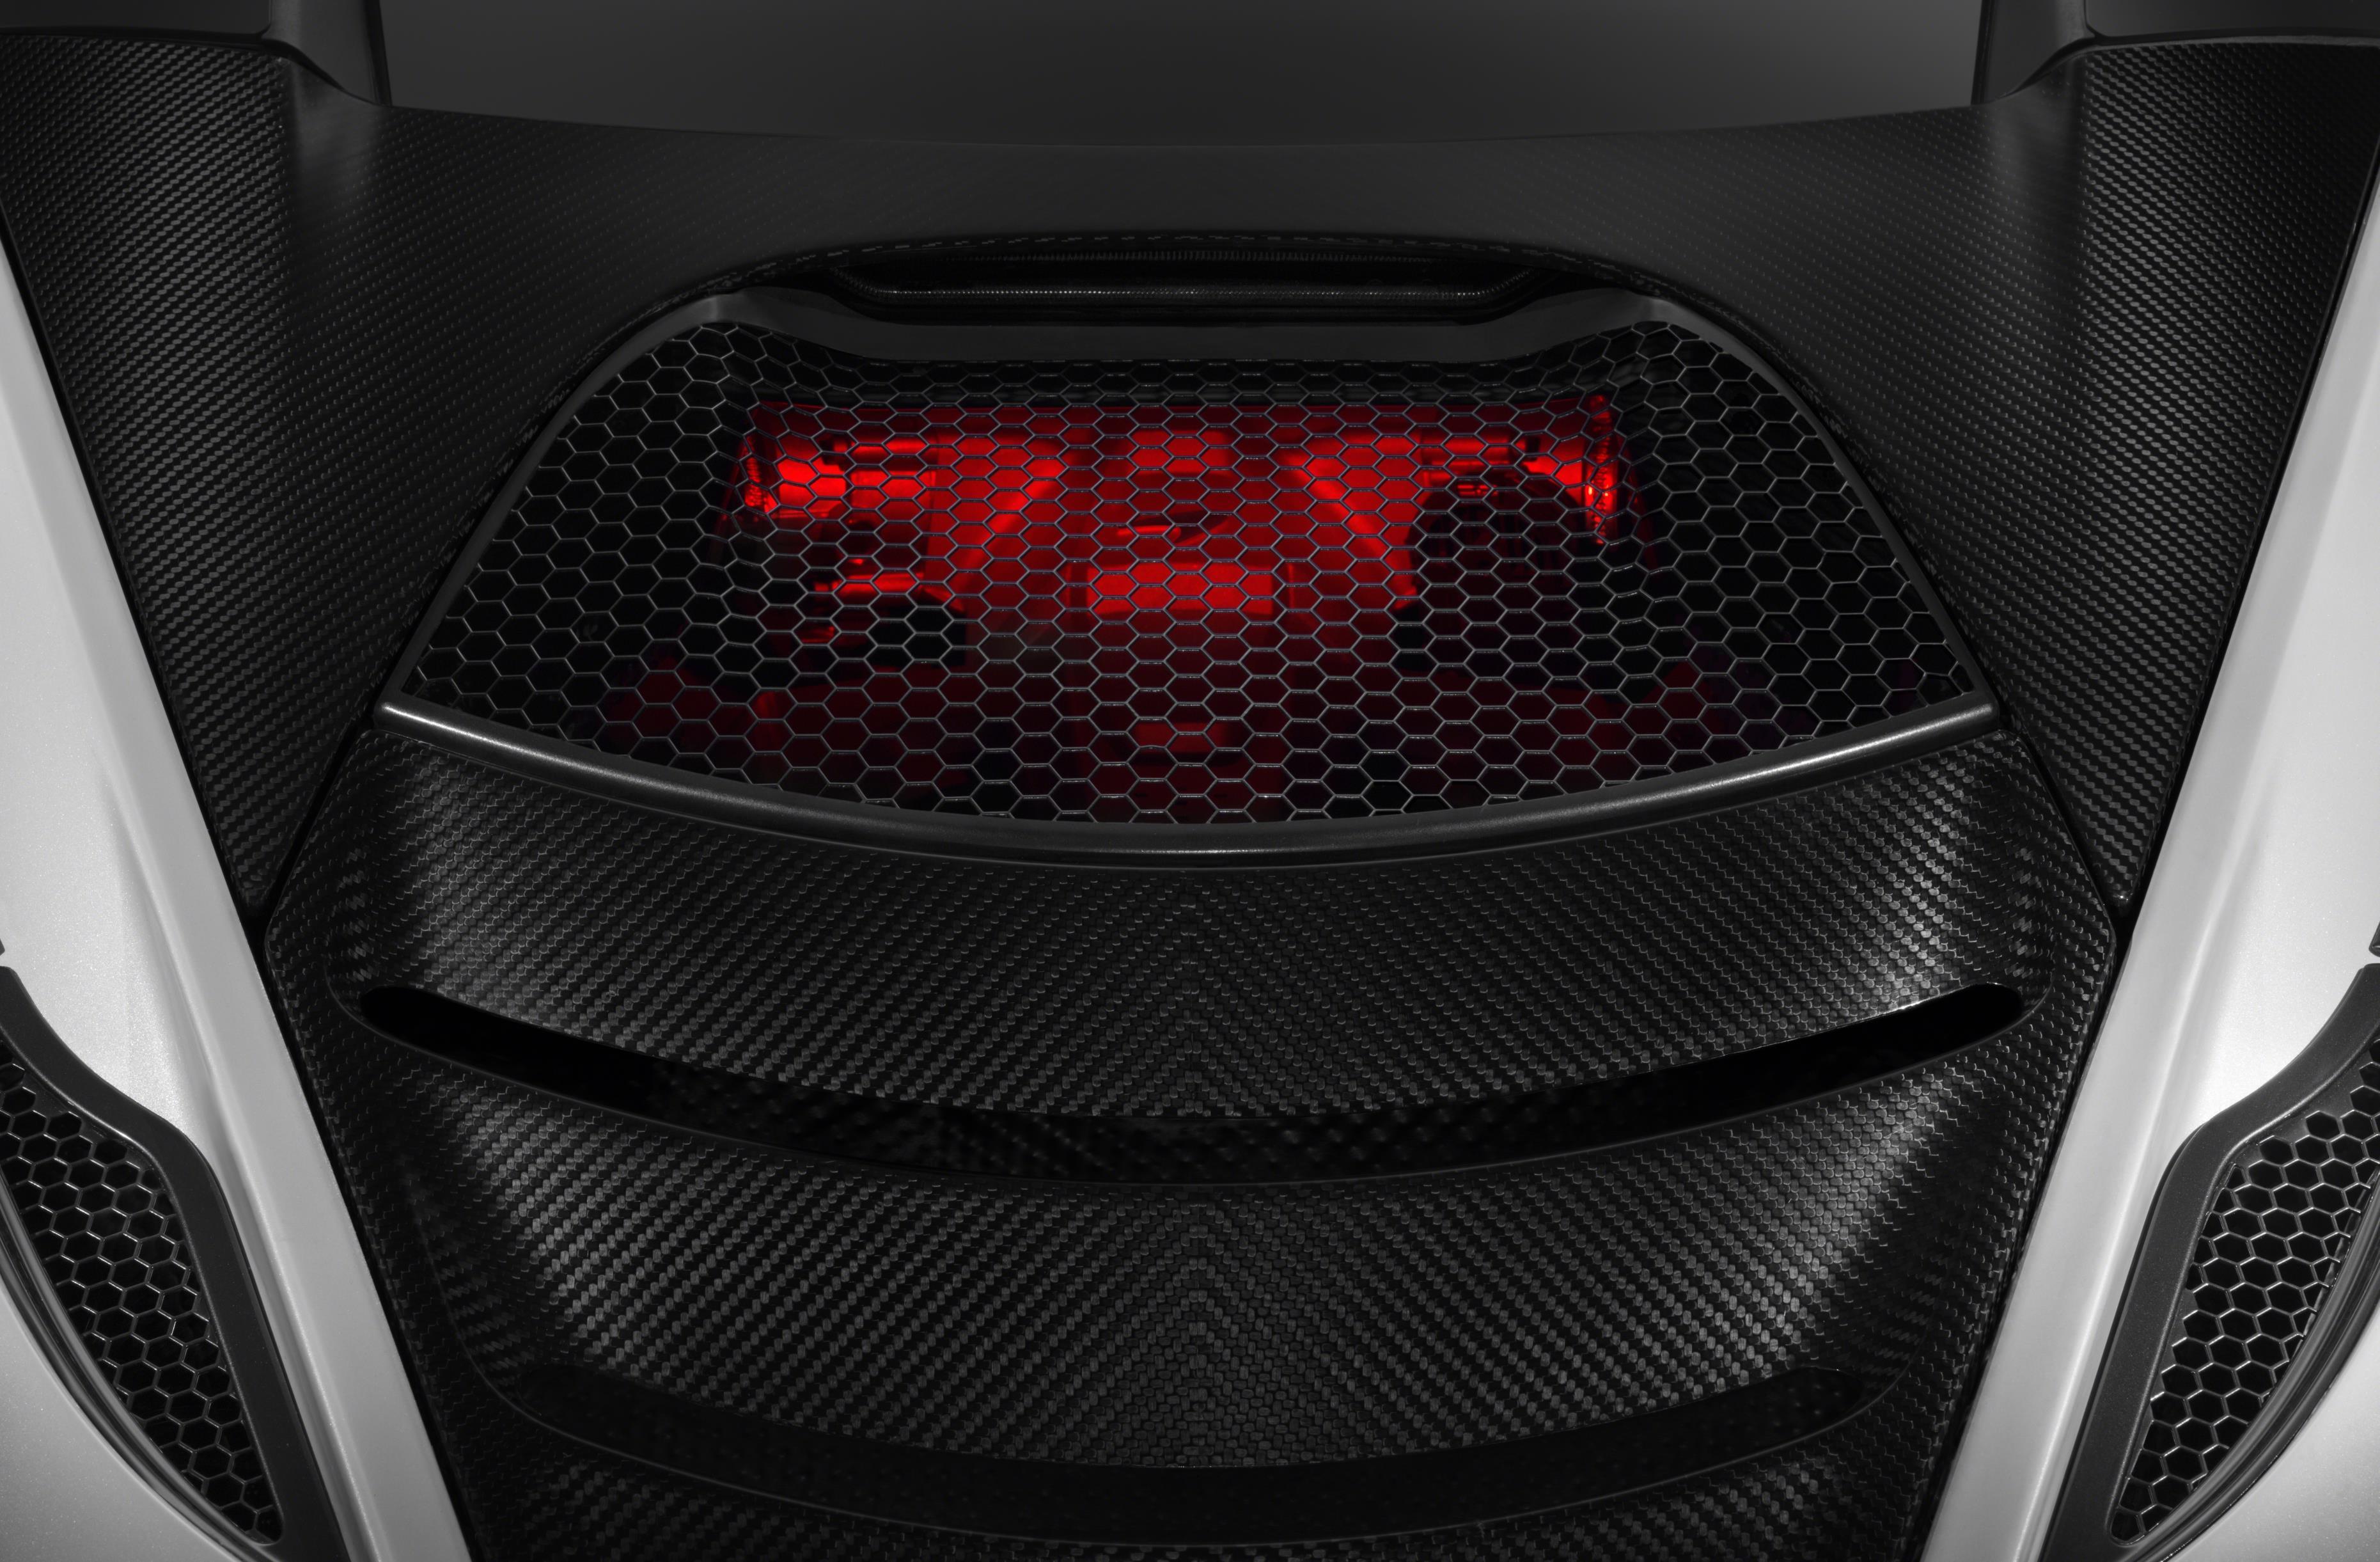 Mclaren Confirms 4 0 Liter Twin Turbo V8 M840t For 720s